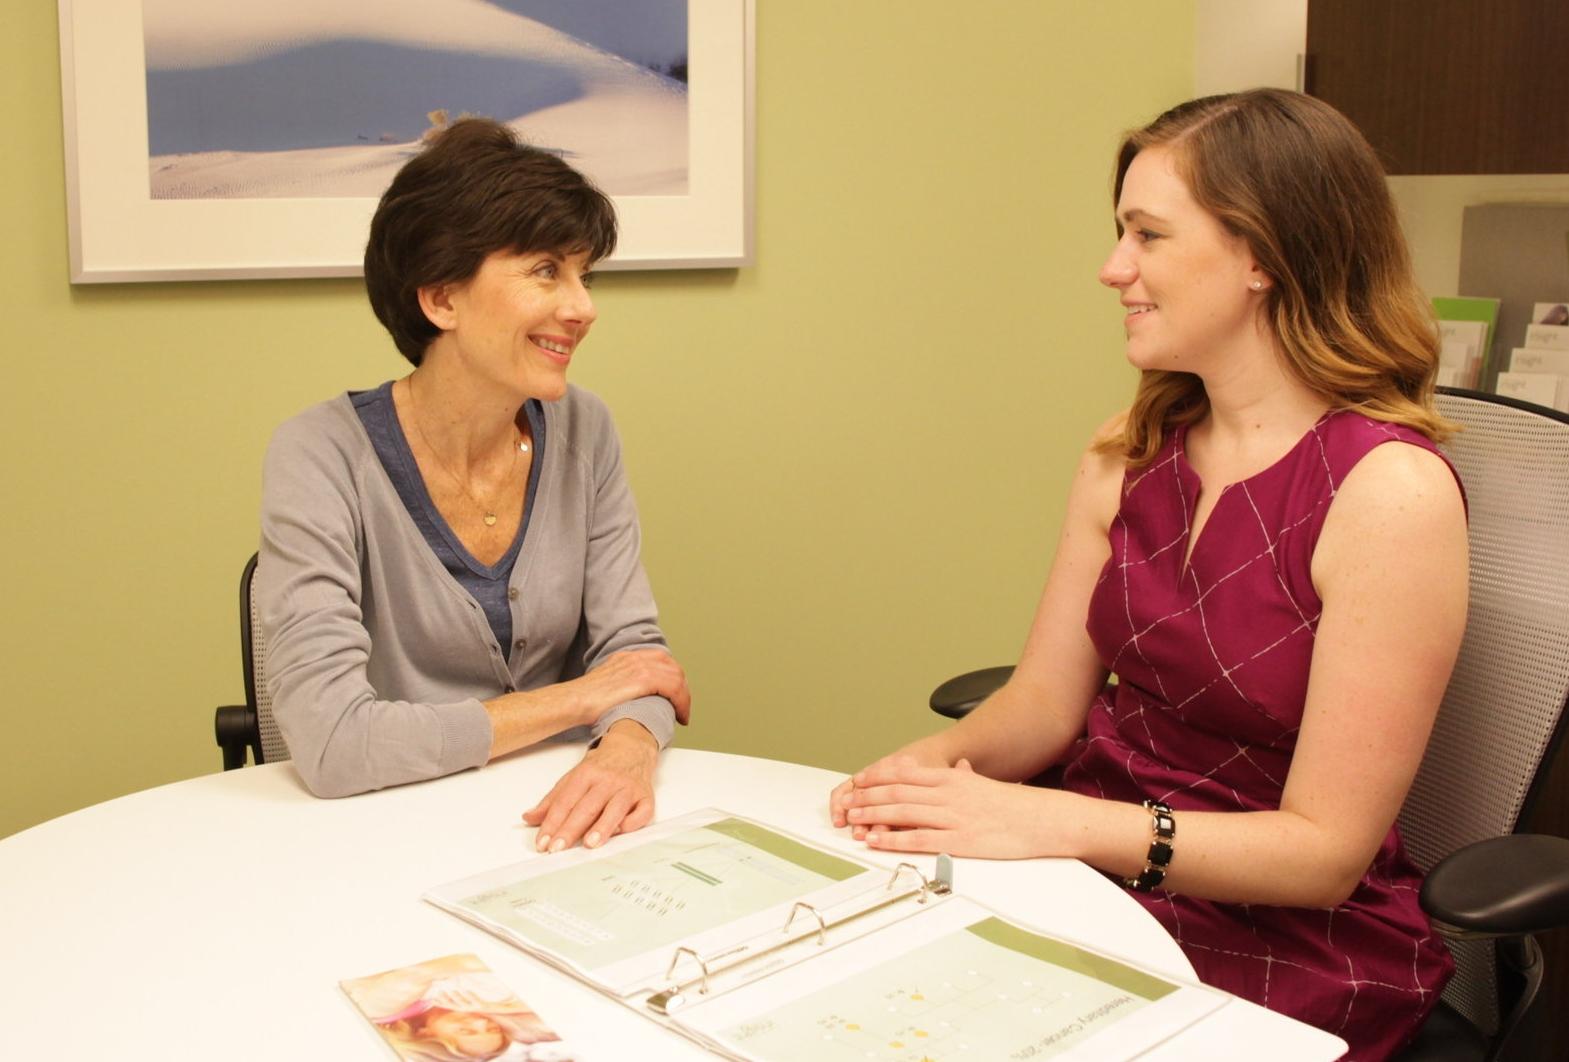 holley-ovarian-cancer-article_33824040005_o.jpg